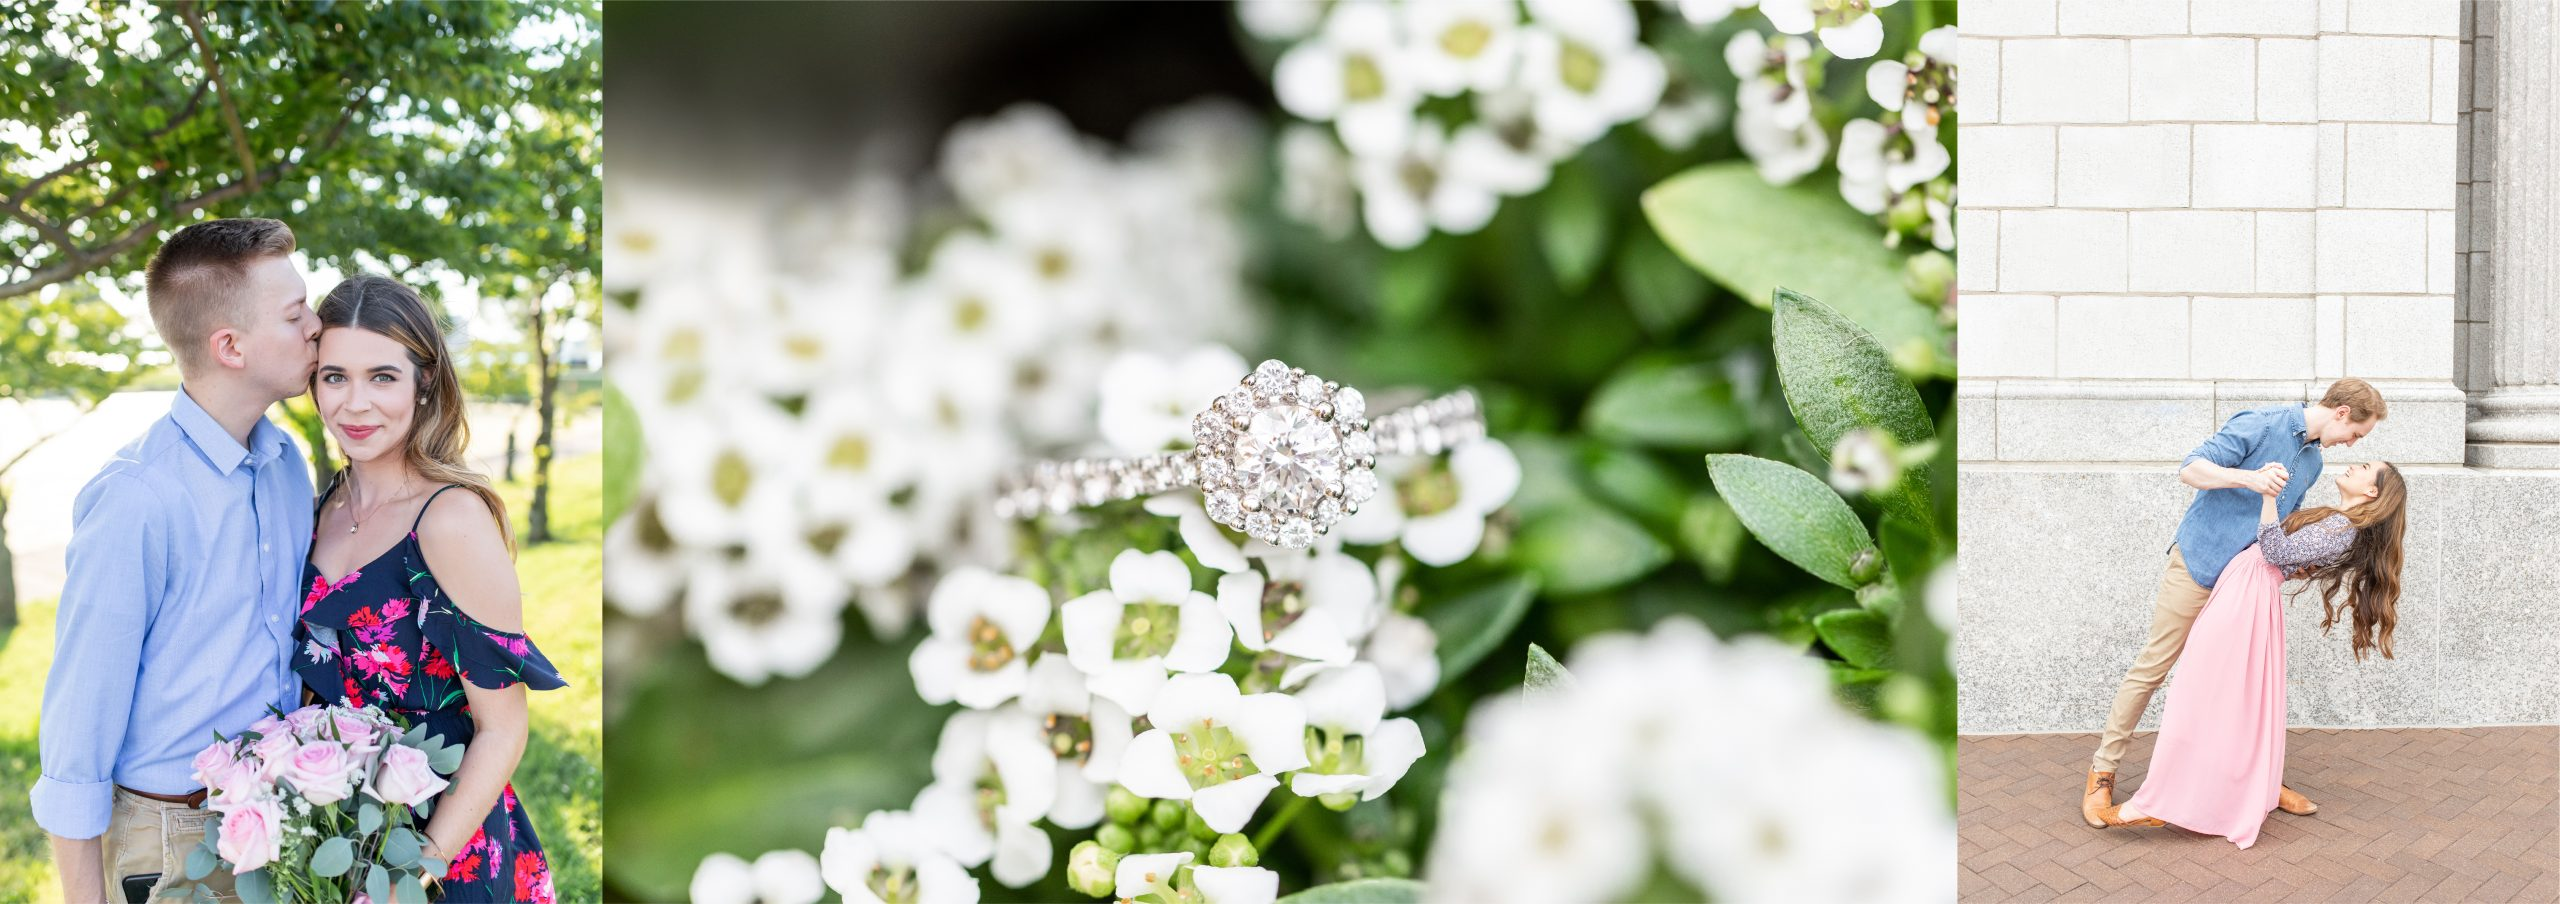 kandra-lynn-photography-wedding-photographer-06